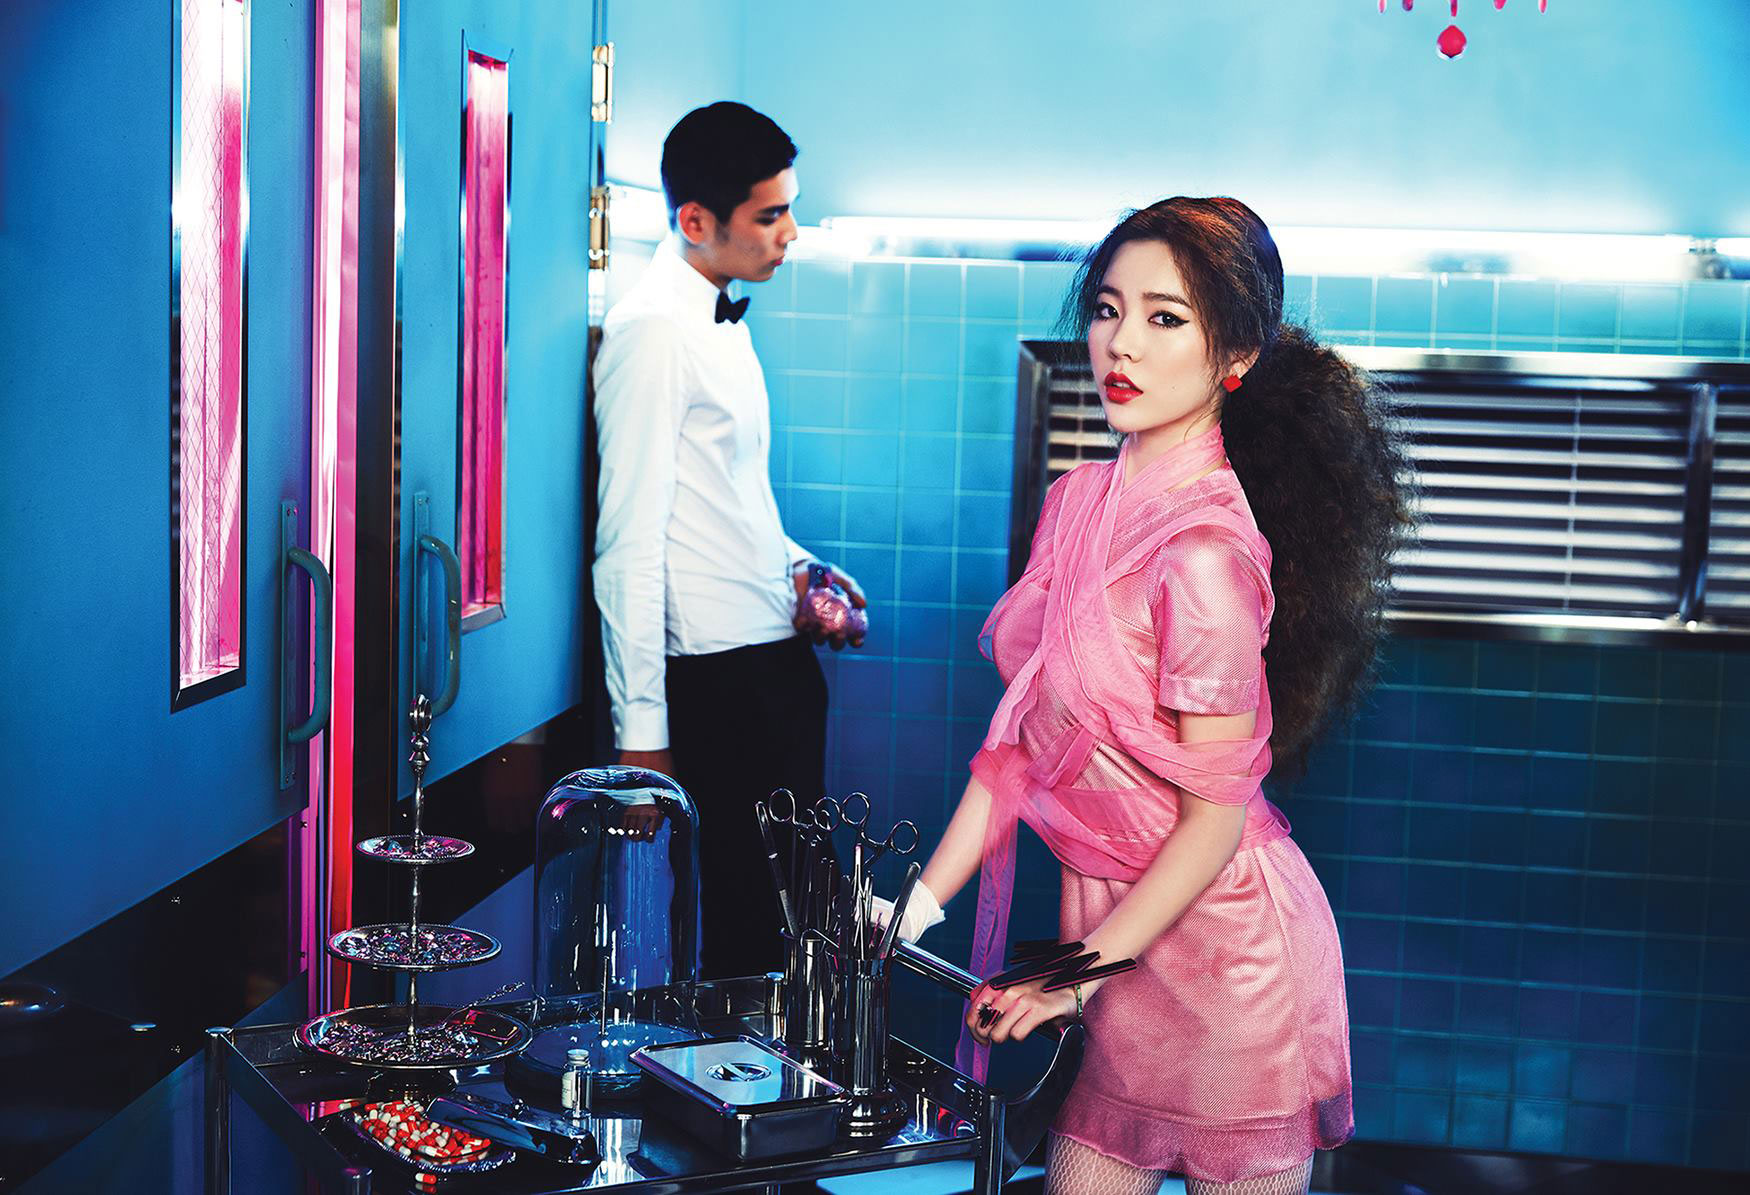 Sunny Girls Generation Wallpaper Korean Pop Group Girls Generation Profile